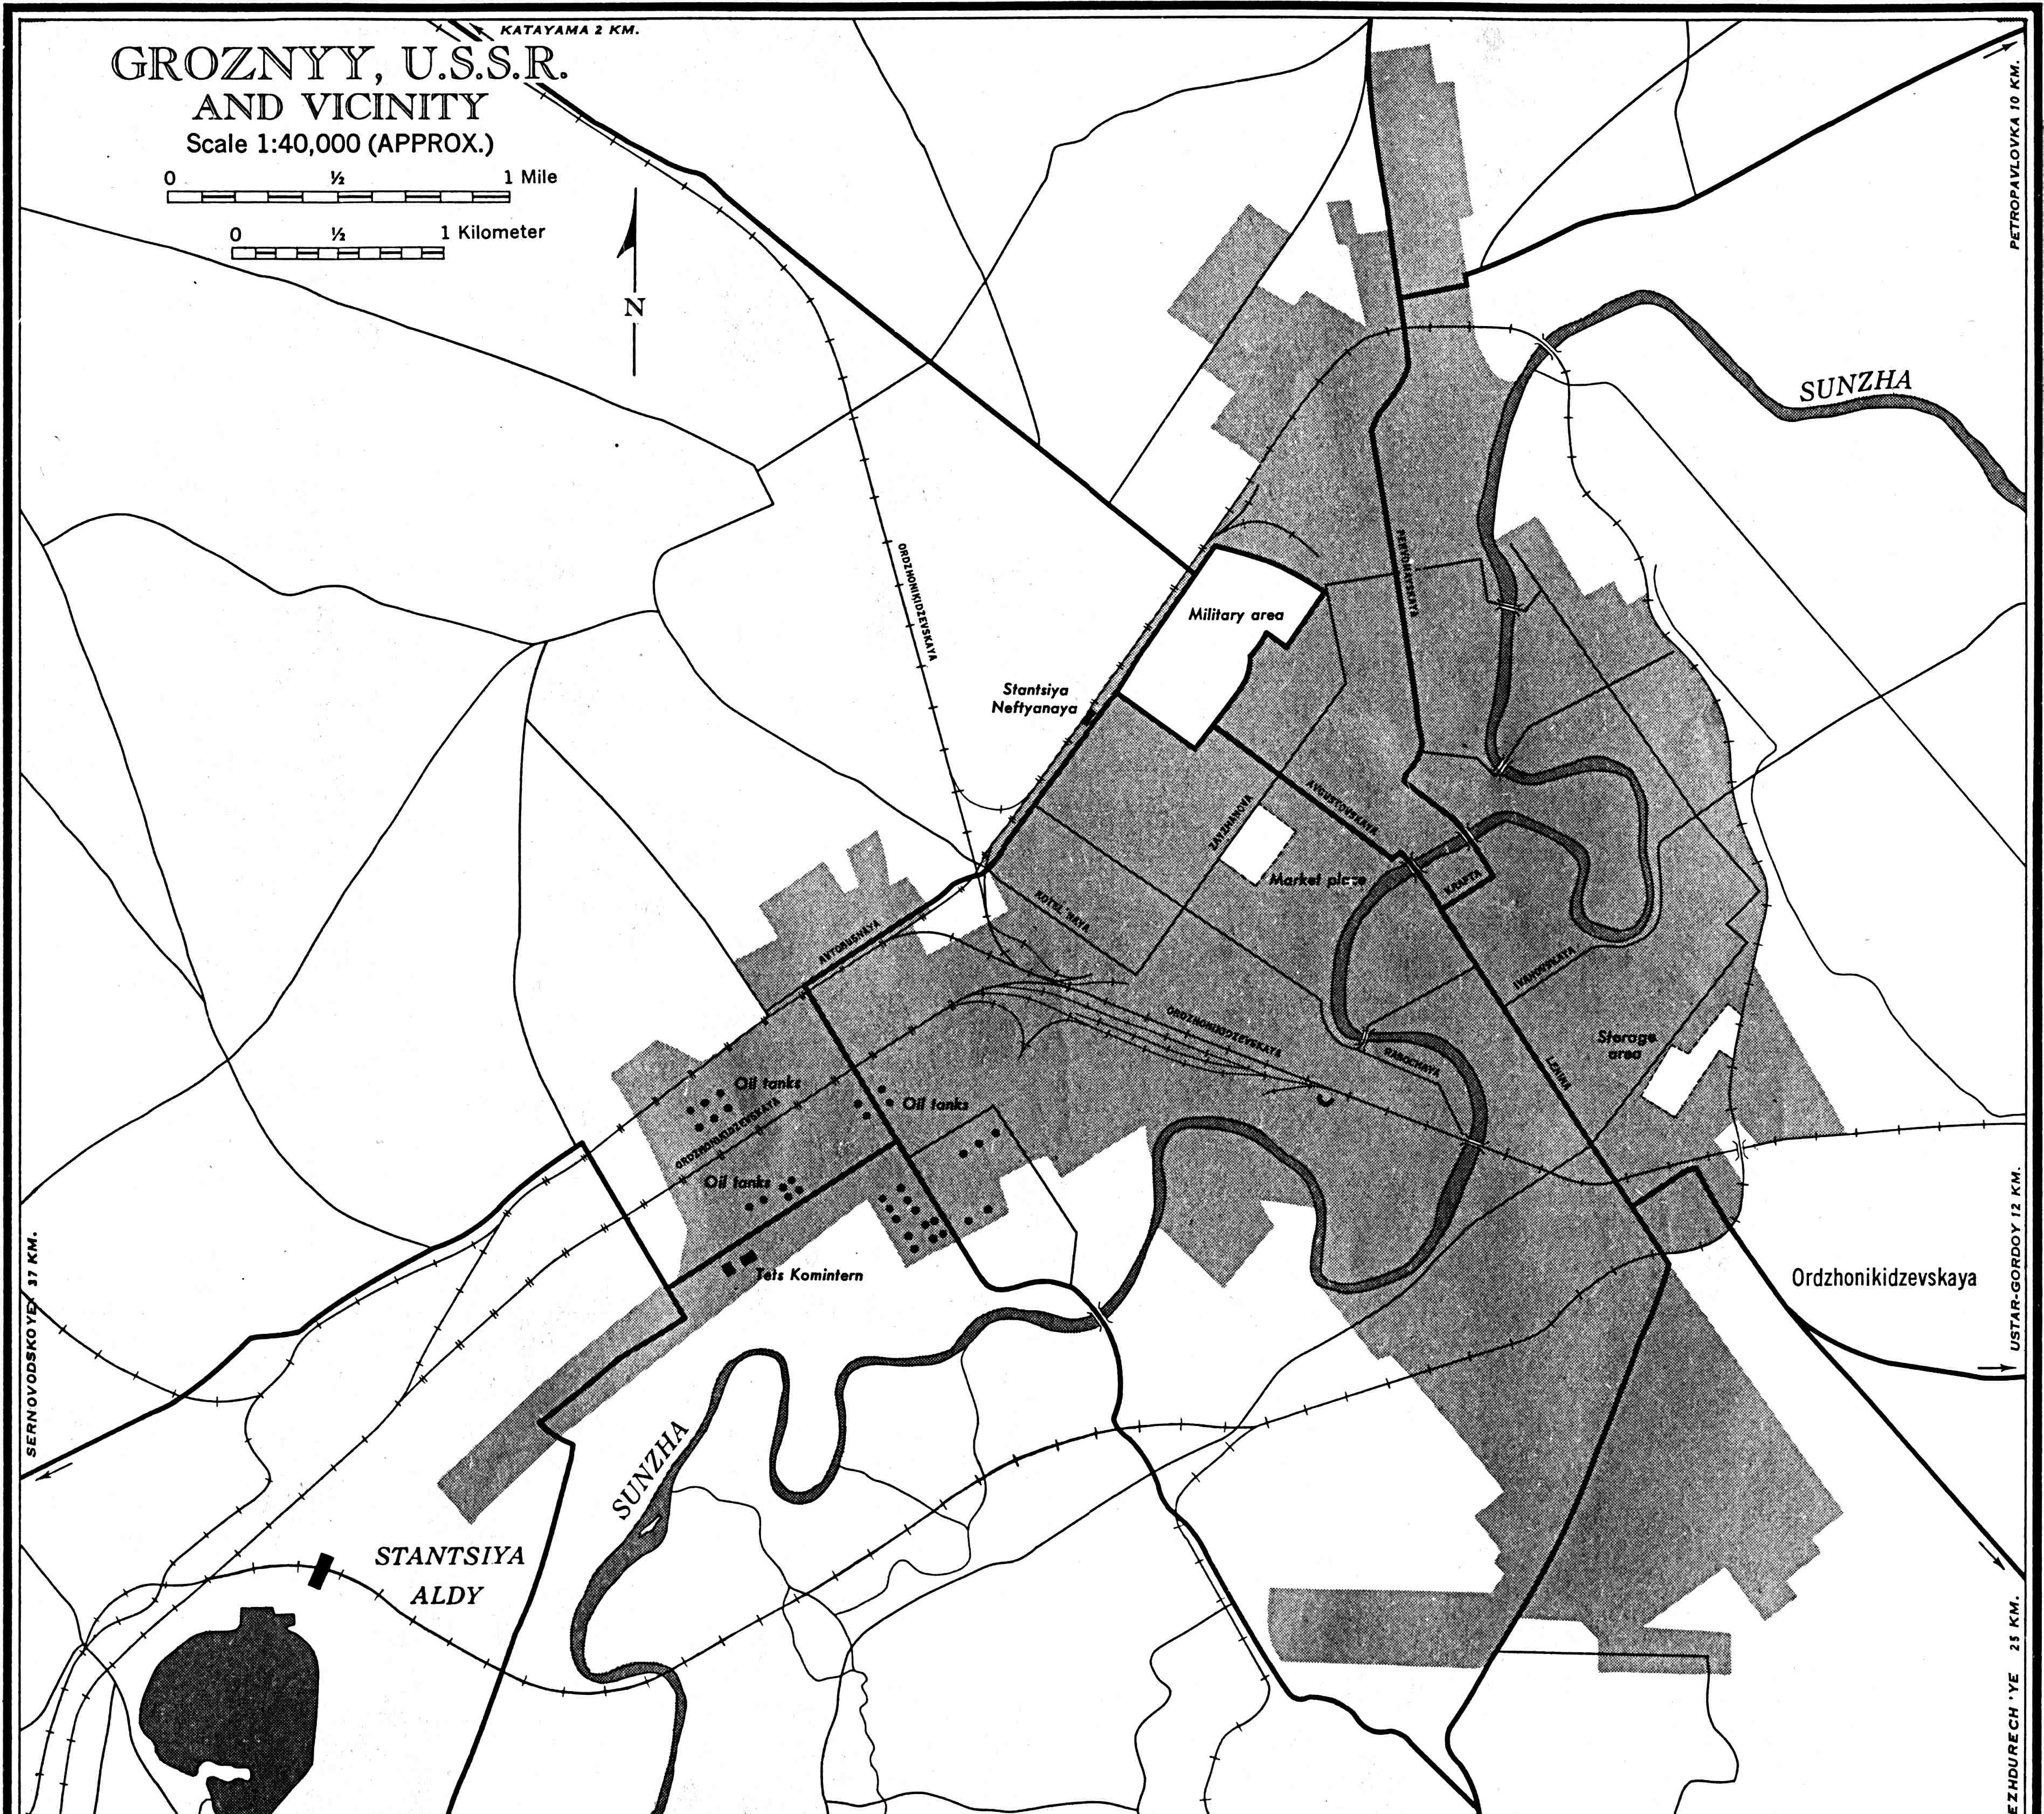 Grozny and Vecinity Map, Chechnya, Russia 1959